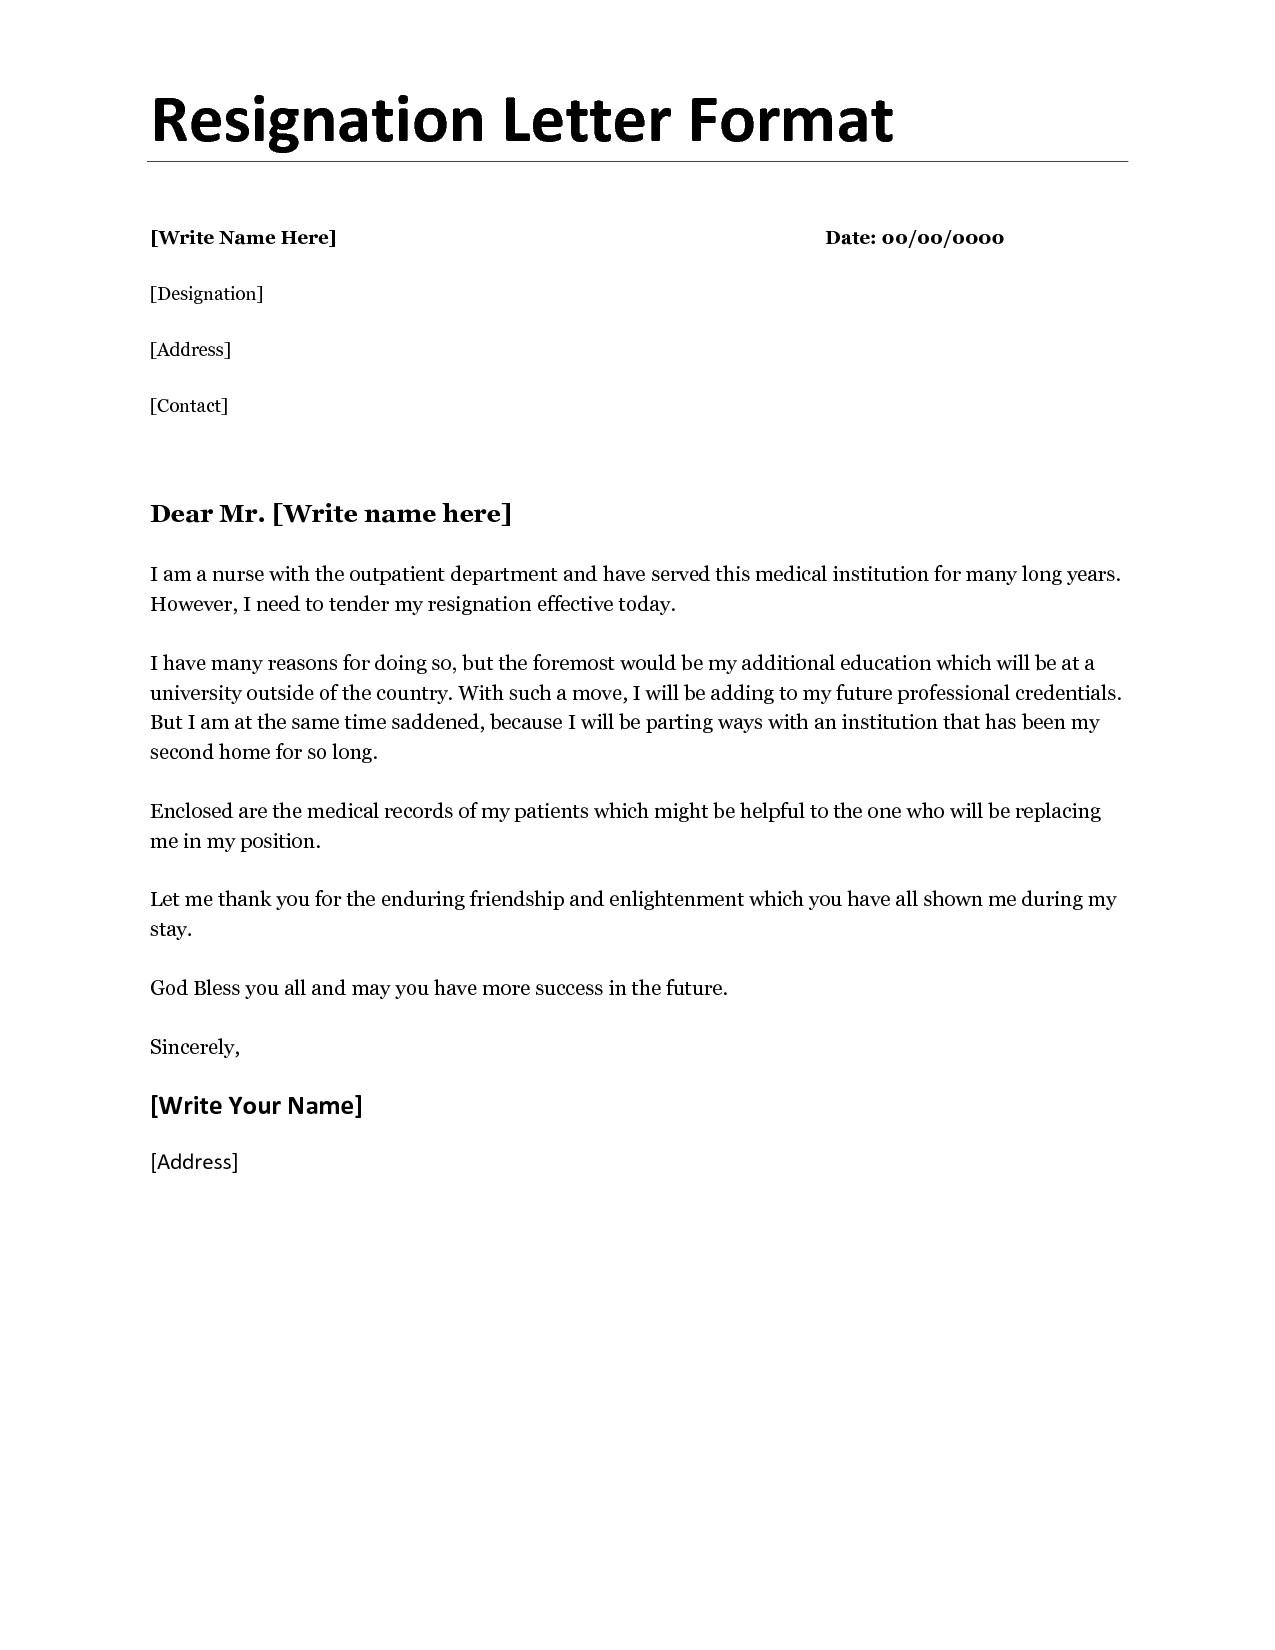 Medical assistant Resignation Letter Best S Of Medical Resignation Letter Medical